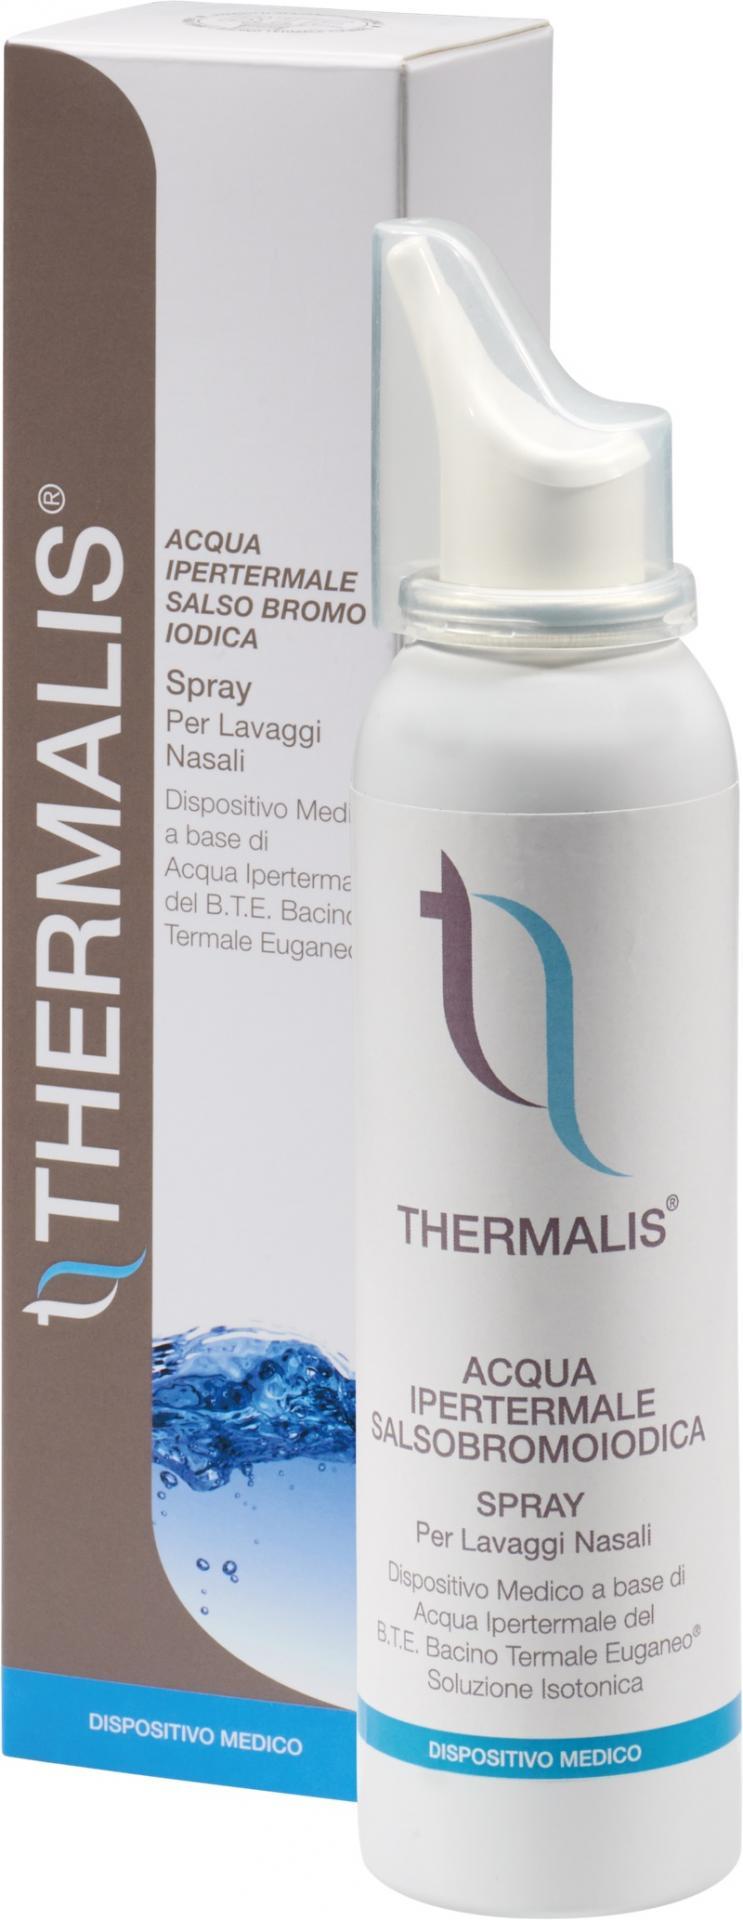 Spray nasale eau hyperthermale dispositif medical class 1